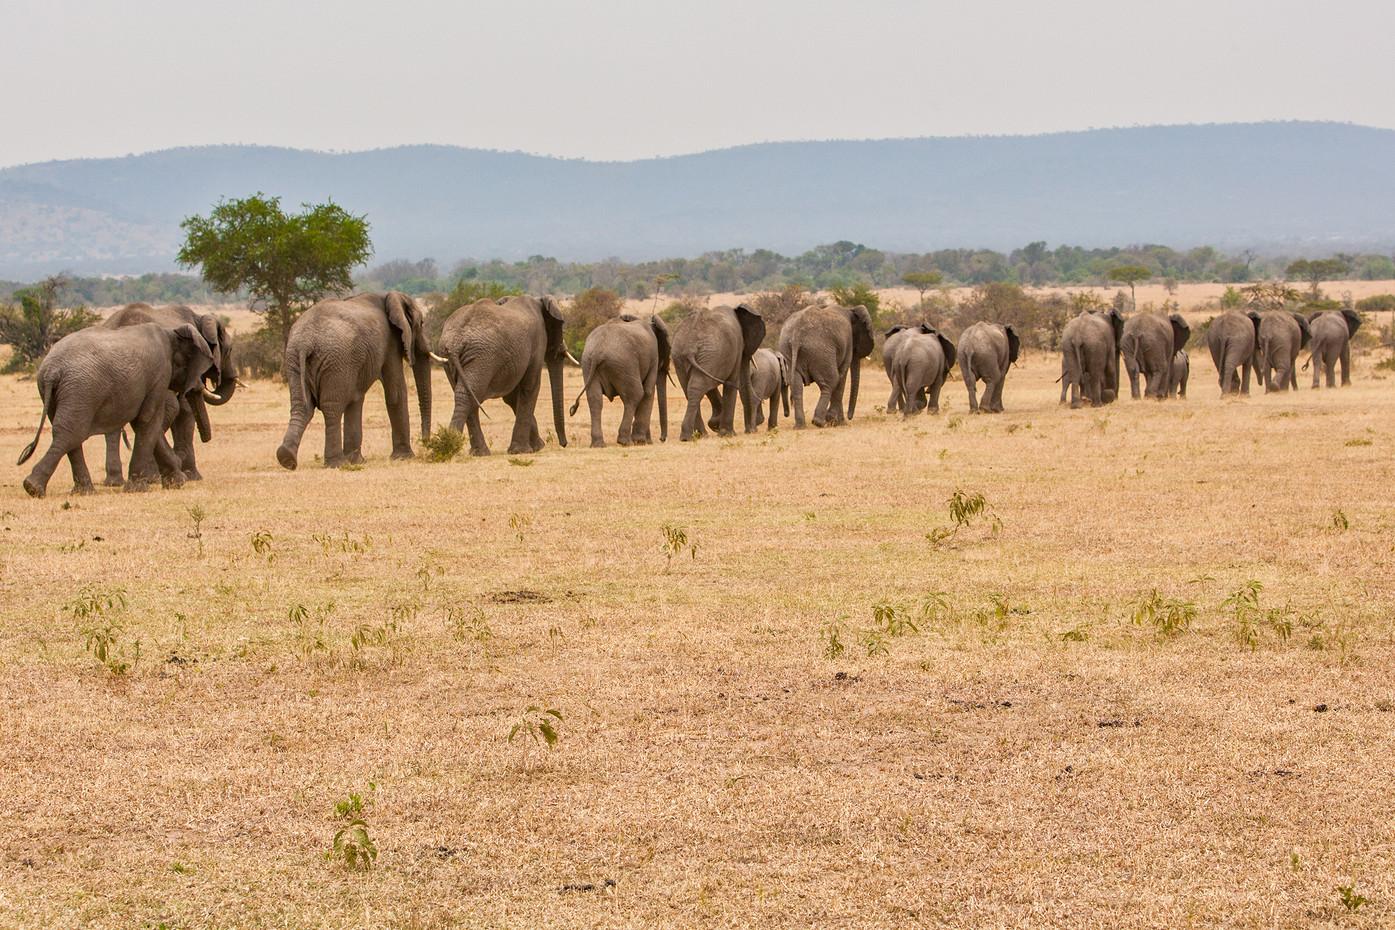 Elephant herd in the Serengeti NP, Tanzania